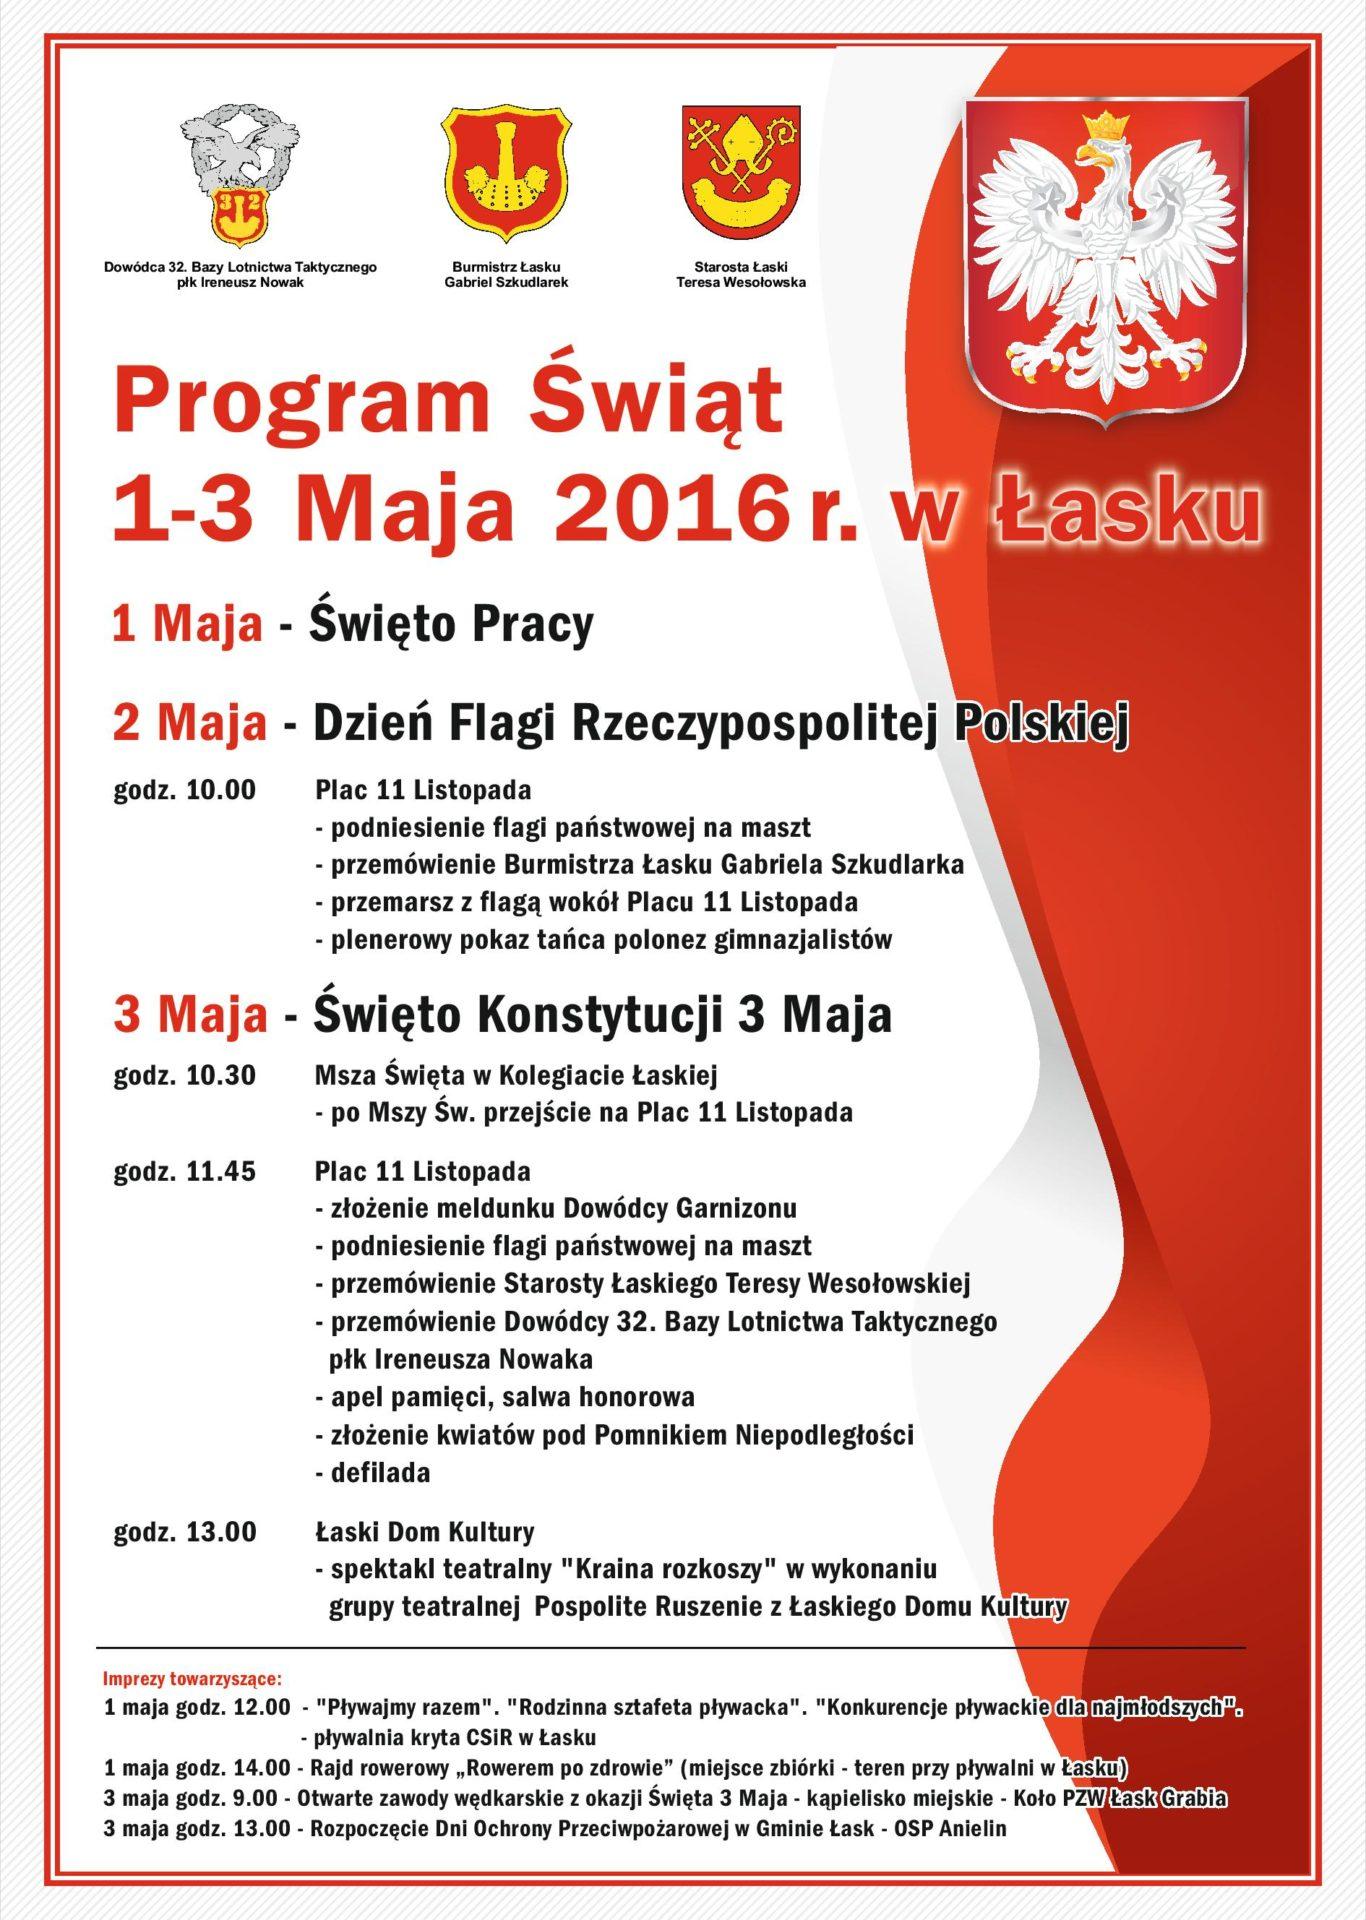 Święta 1-3 Maja 2016 r. w Łasku